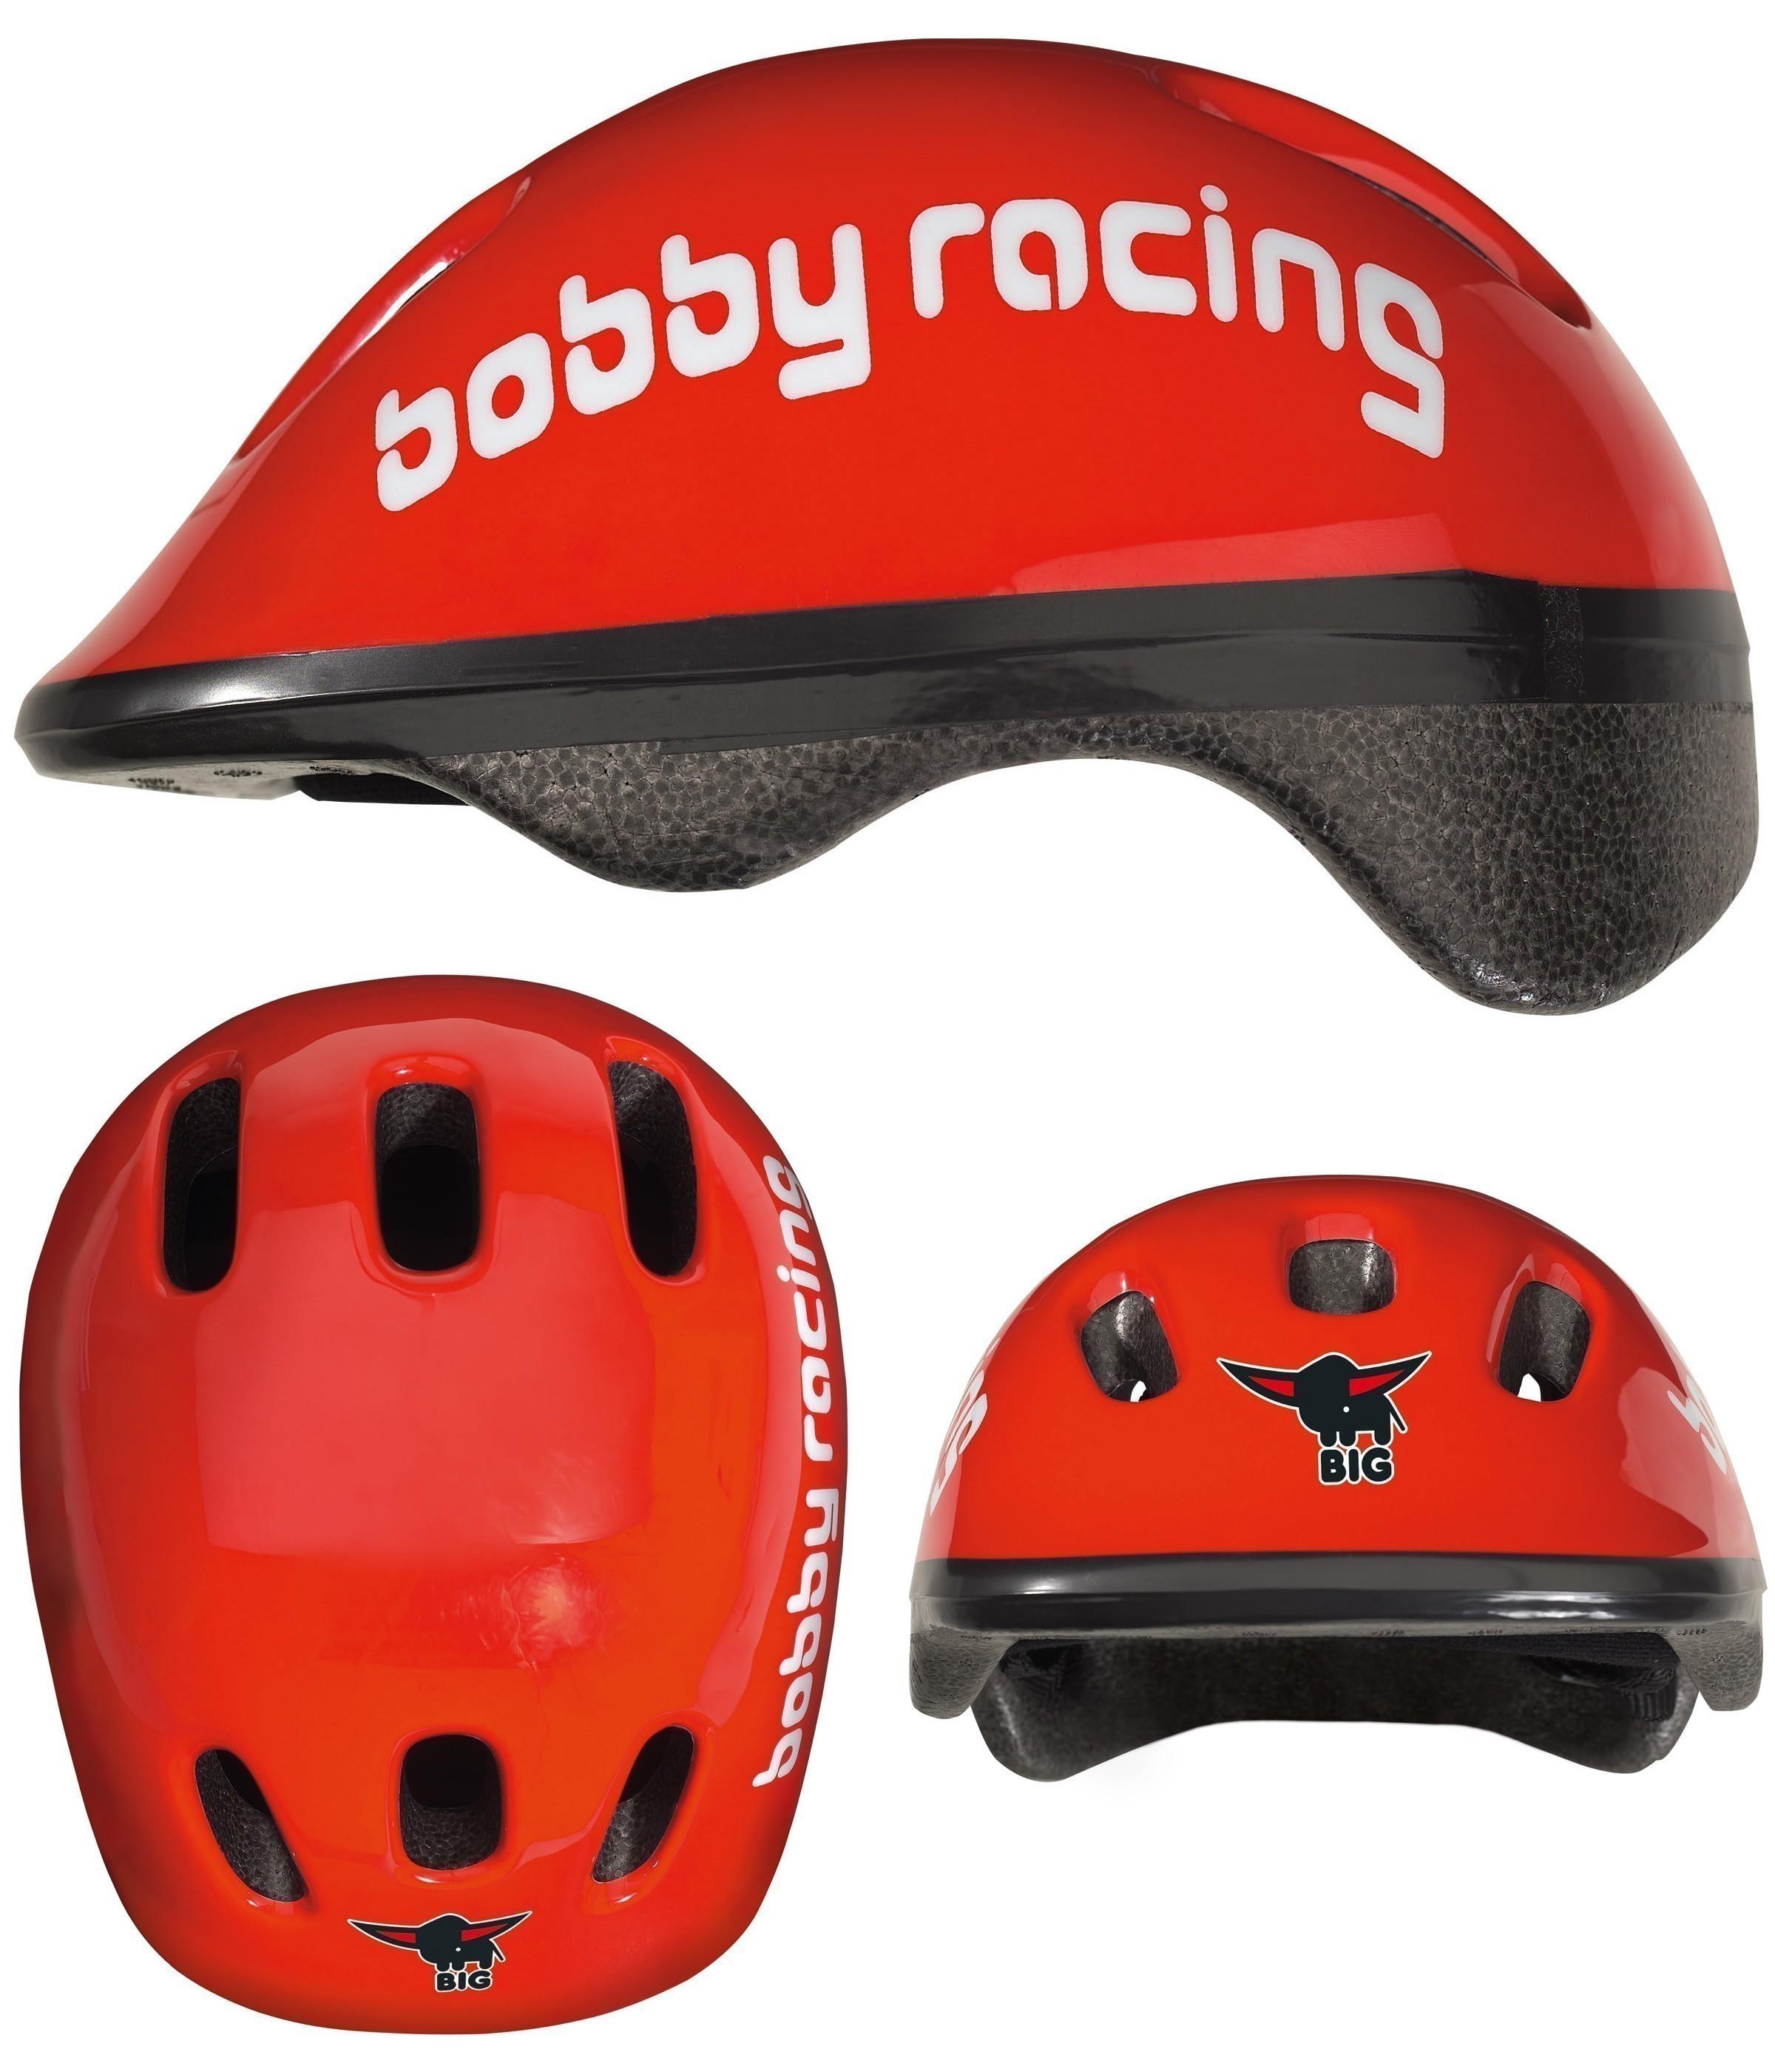 BIG Bobby Racing Helmet / Fahrradhelm Bild 3